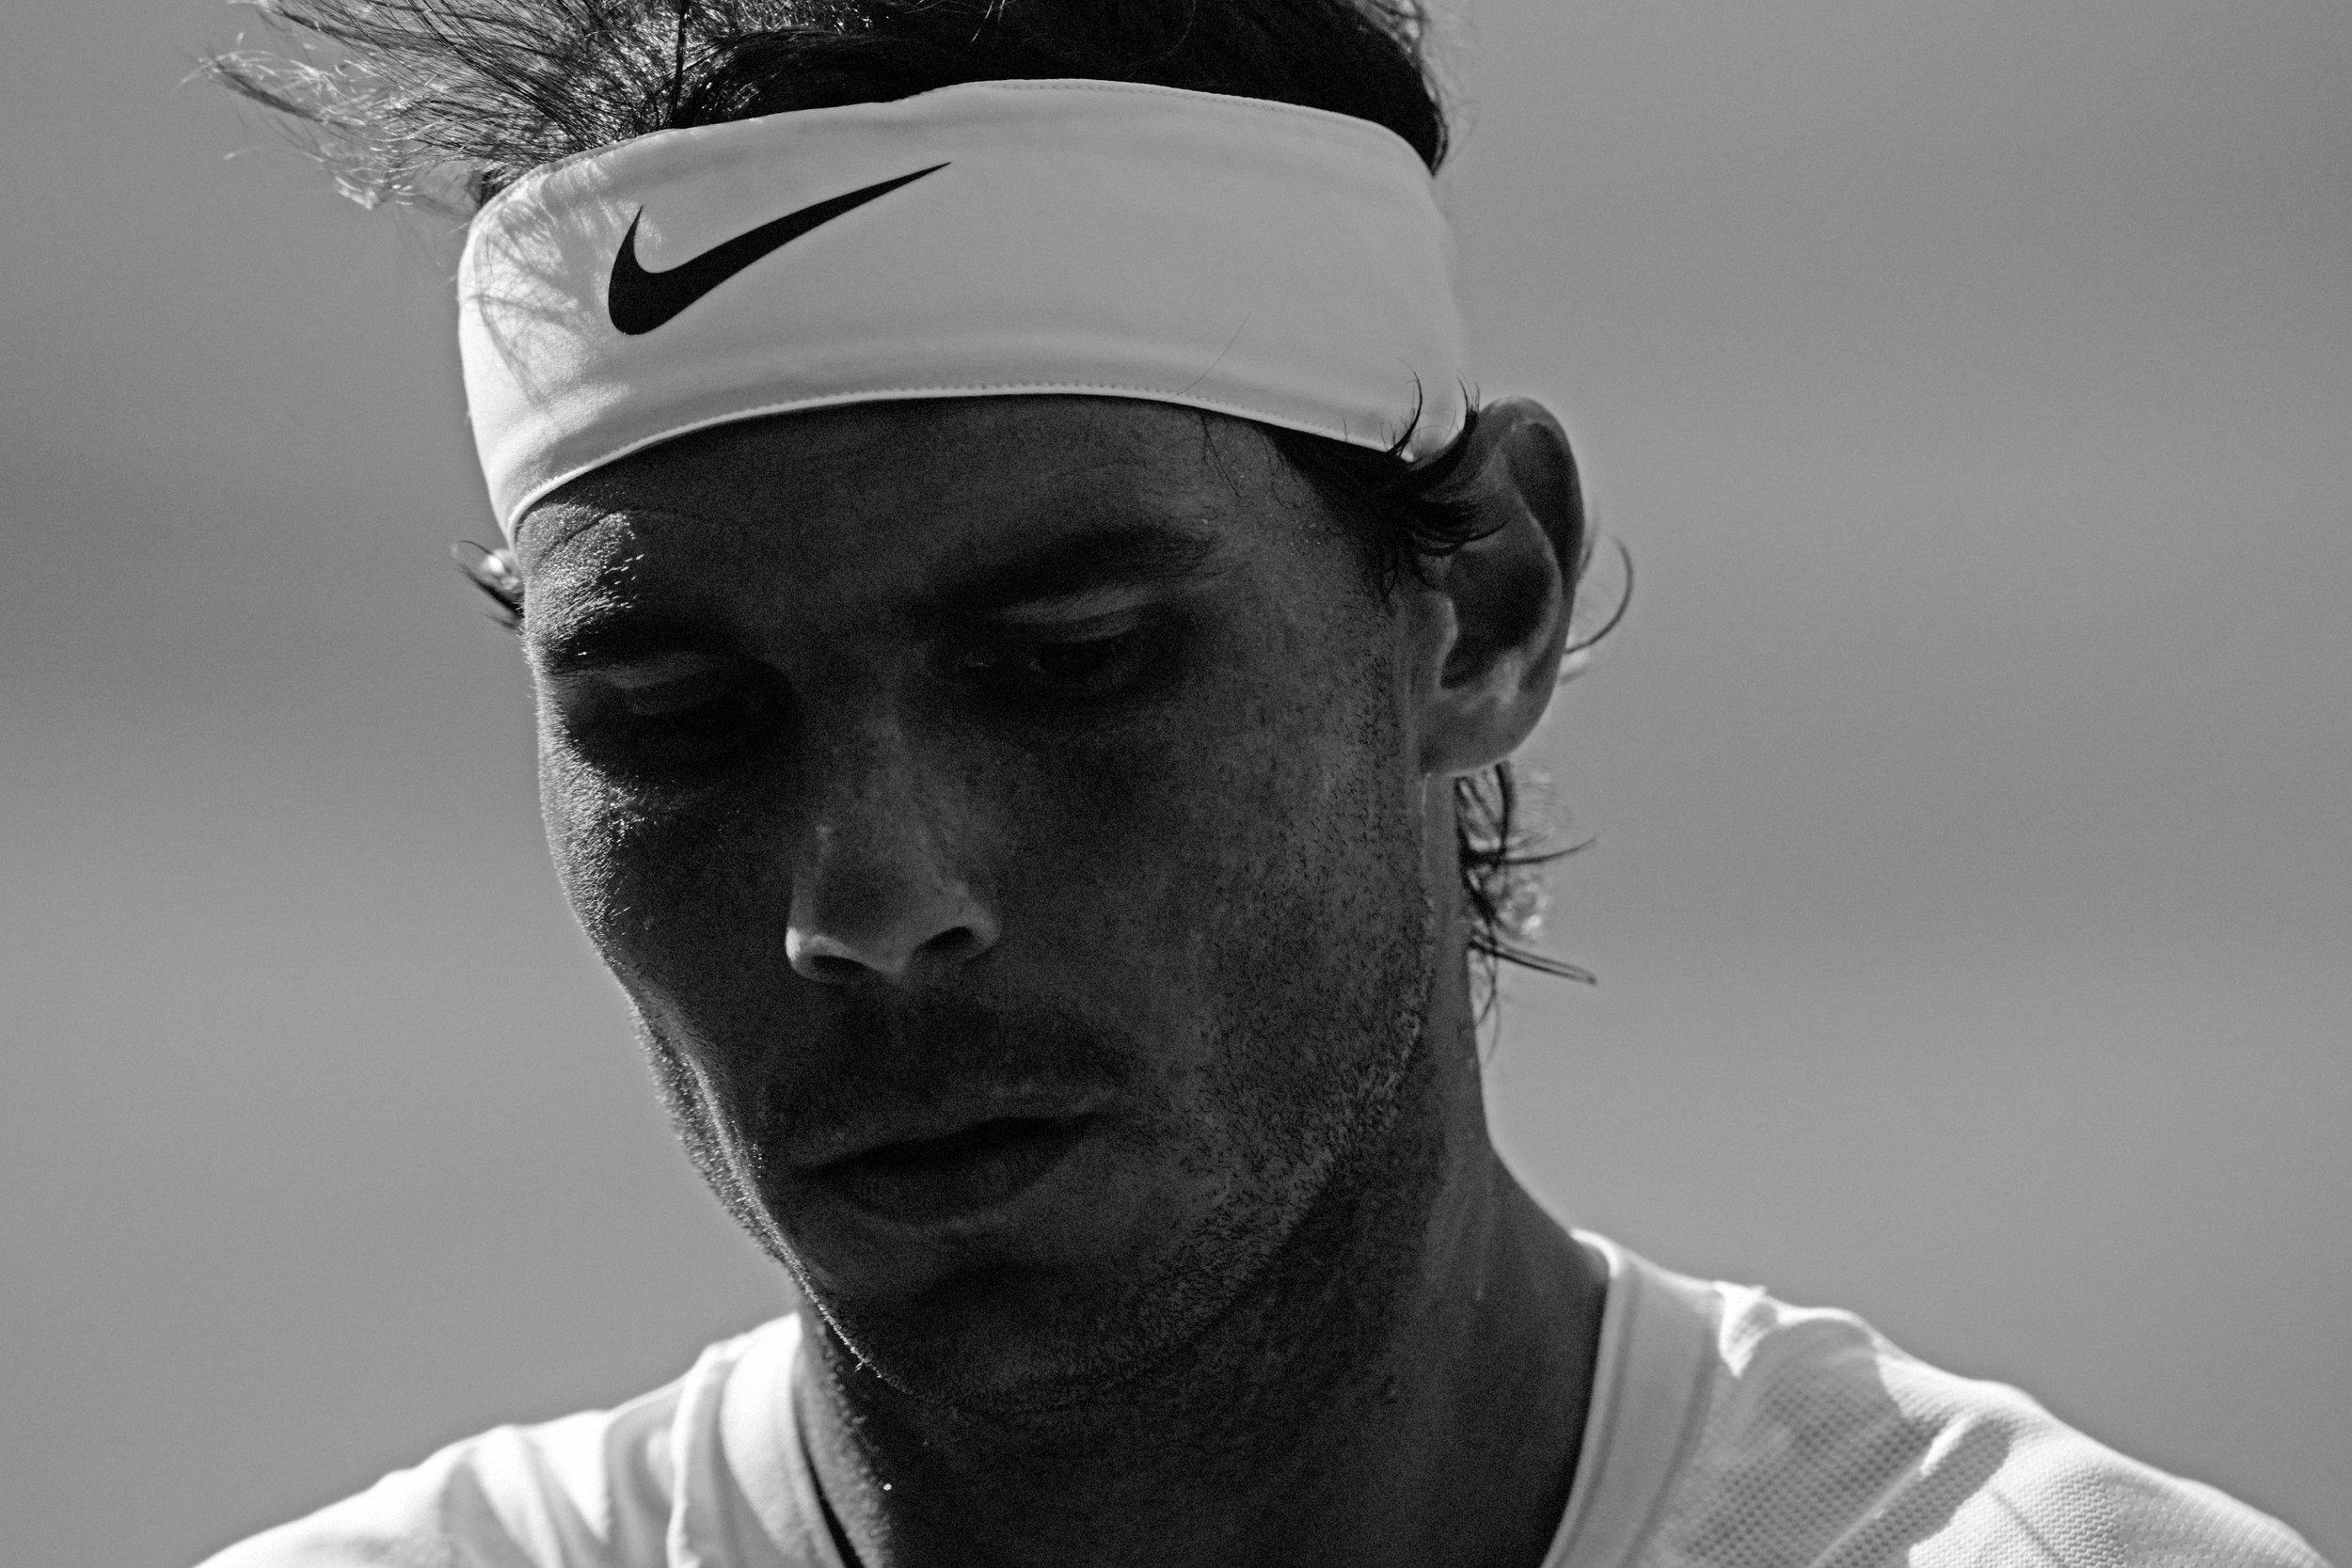 Wimbledon_New_York_Times_Stockdale62.jpg